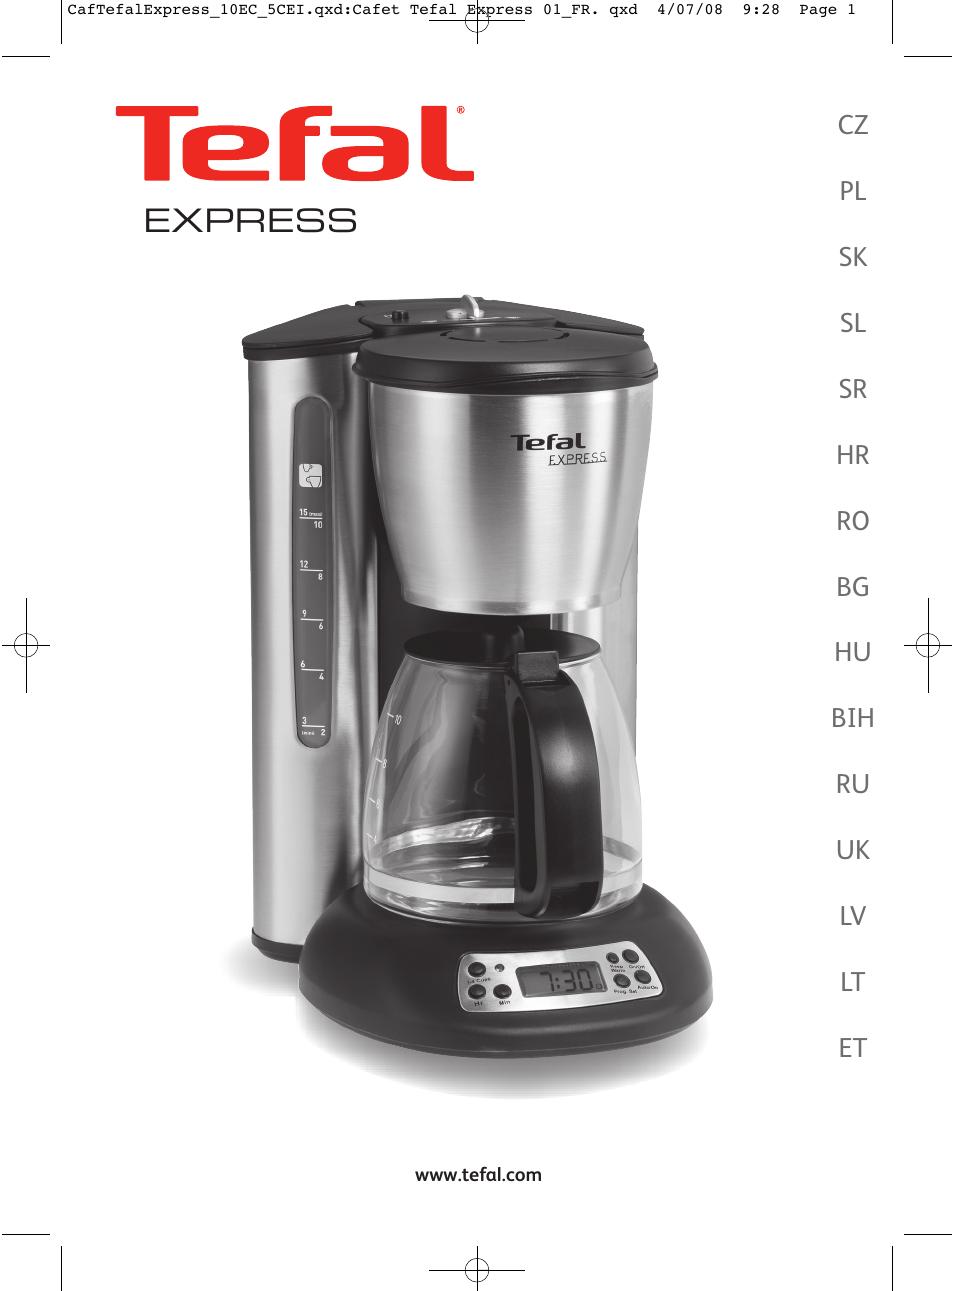 Кофеварка saturn tirana инструкция